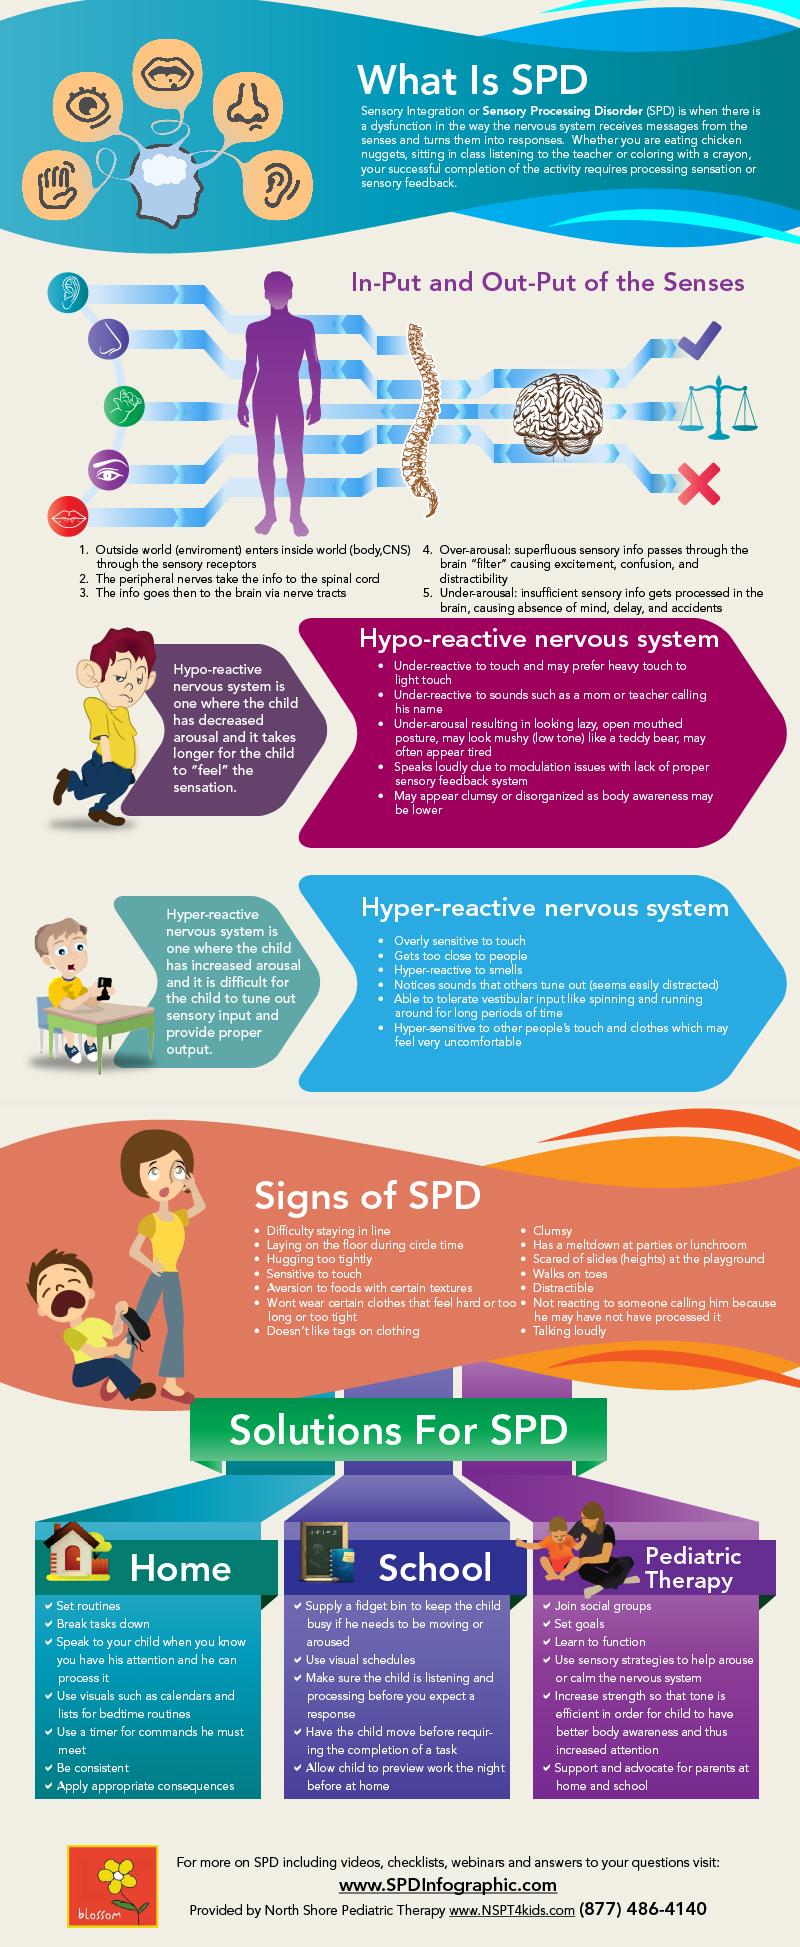 spd-infographic